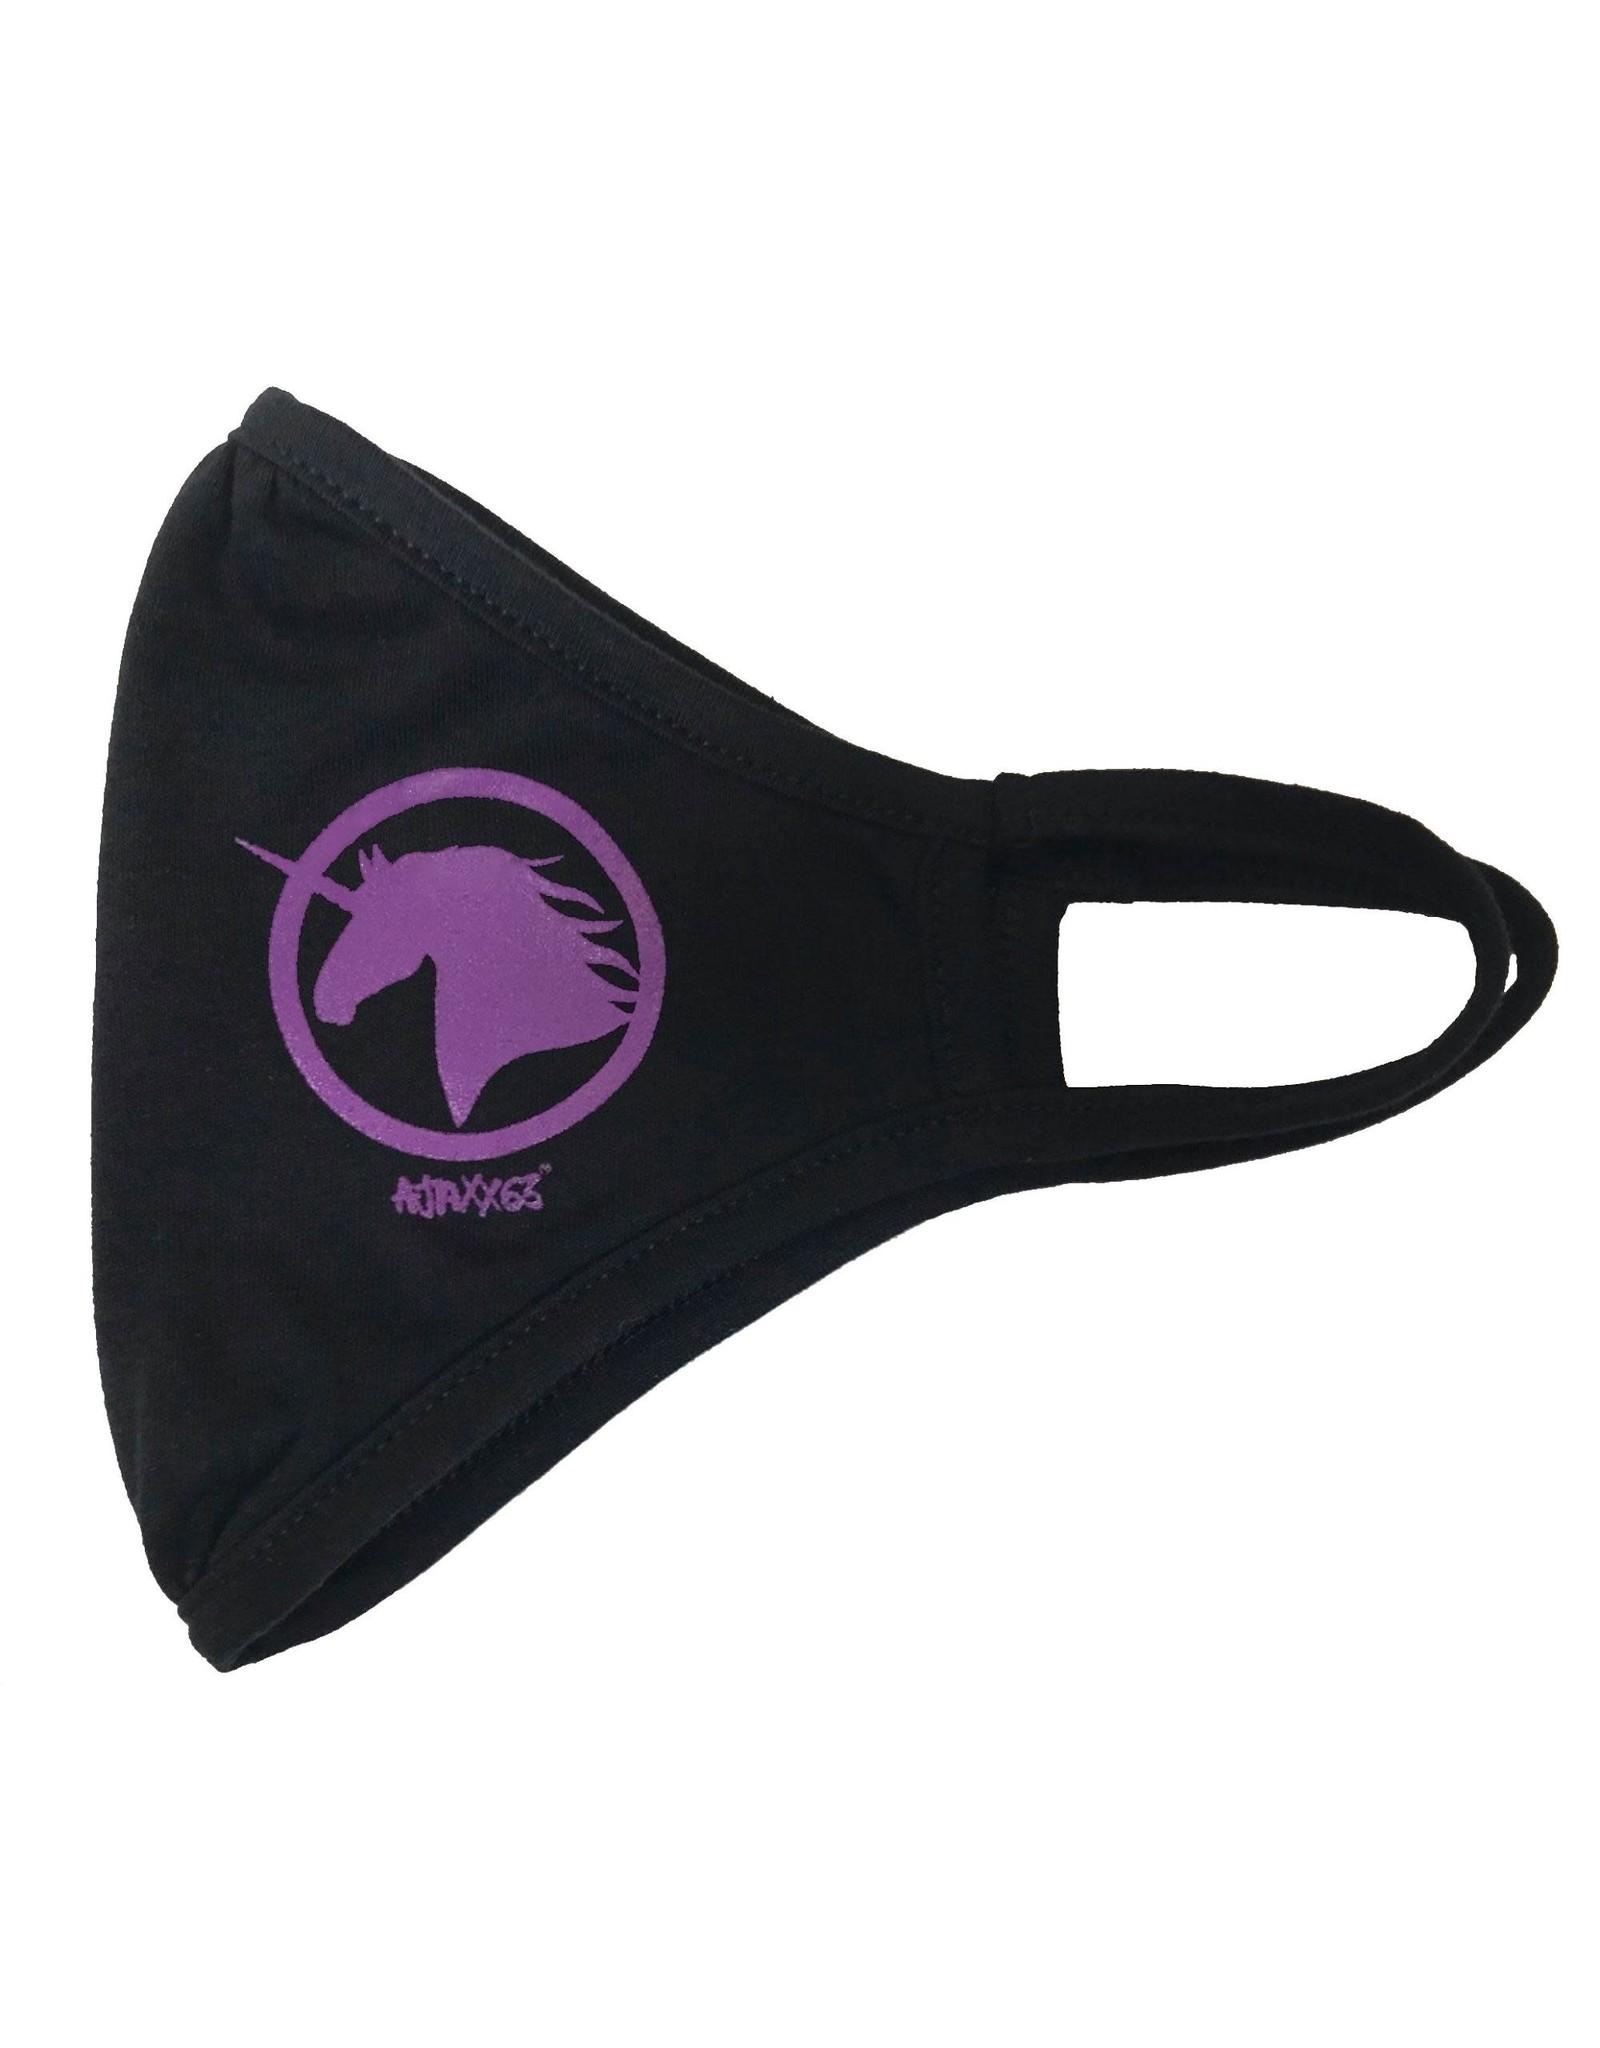 ajaxx63 ajaxx63 Unicorn Sports Style Face Mask